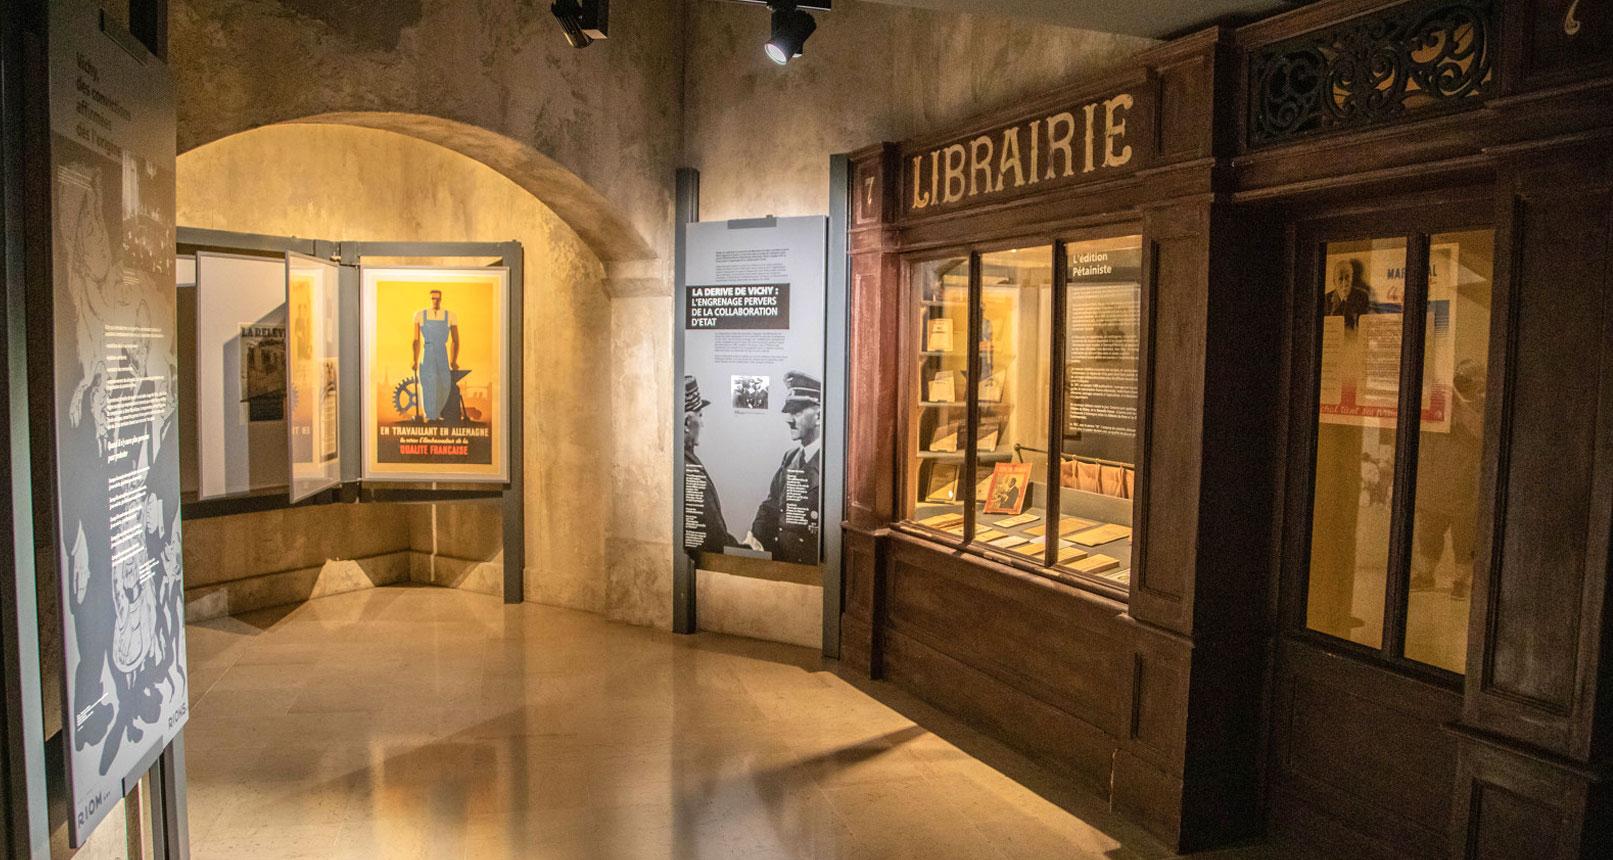 Librairy Jean Garcin 39-45 museum